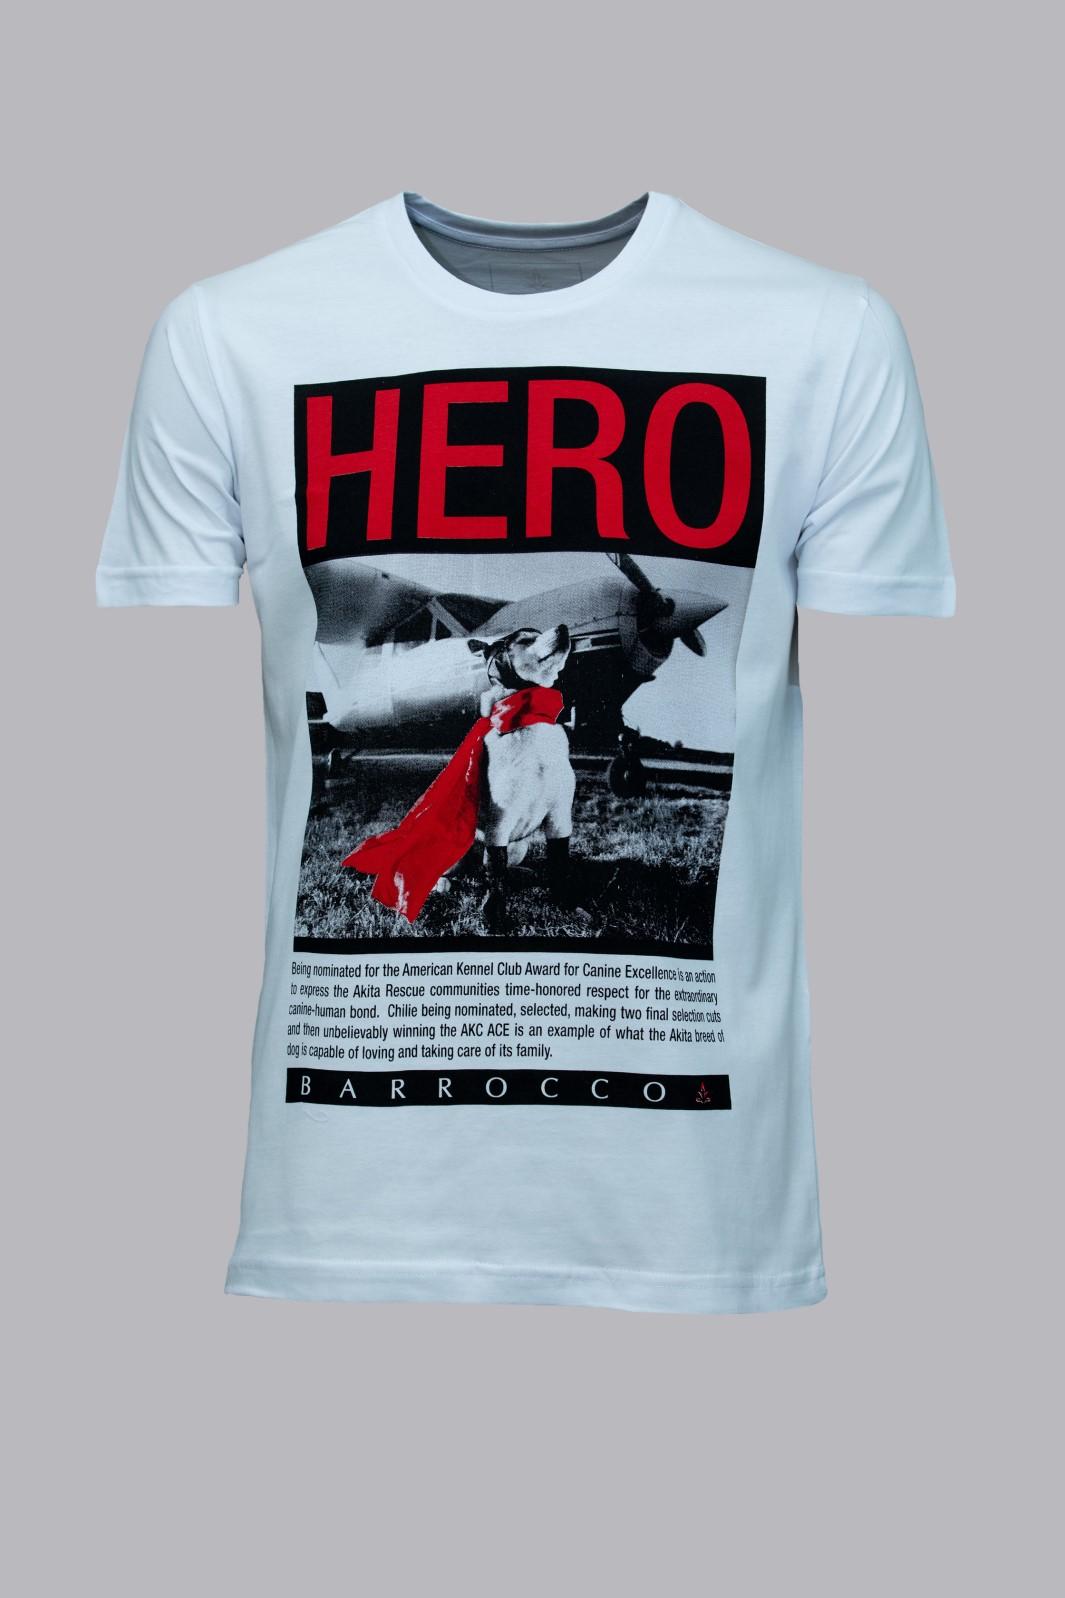 Camiseta Barrocco O Cão Herói